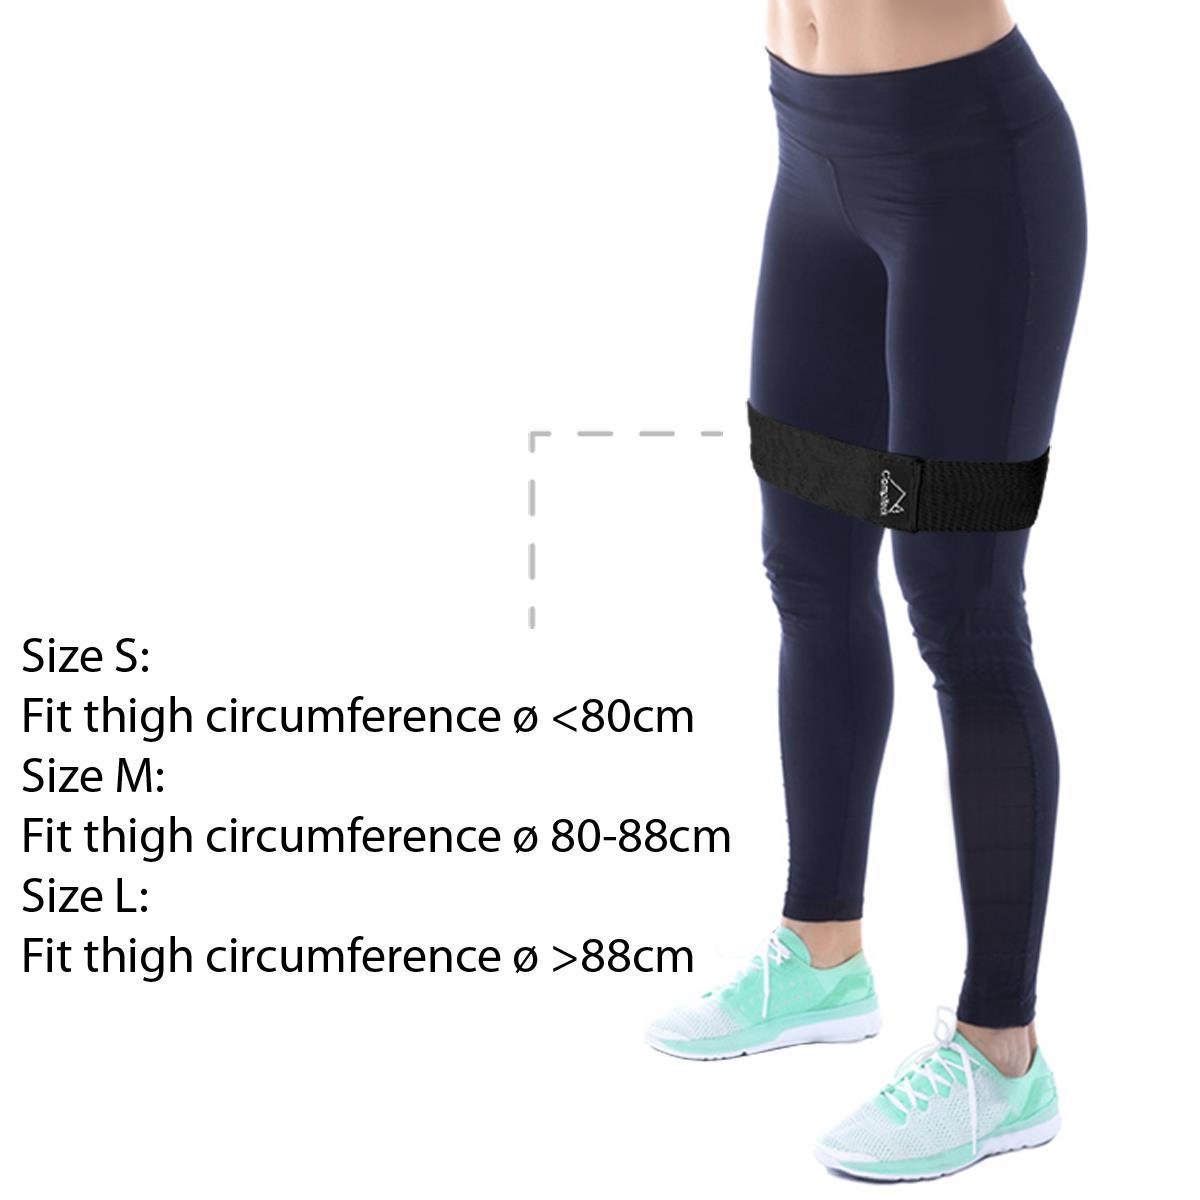 Hip-Band-Circle-Loop-Rotation-Glute-Resistance-Thrust-Leg-Squat-Gym-Exercise miniatuur 4